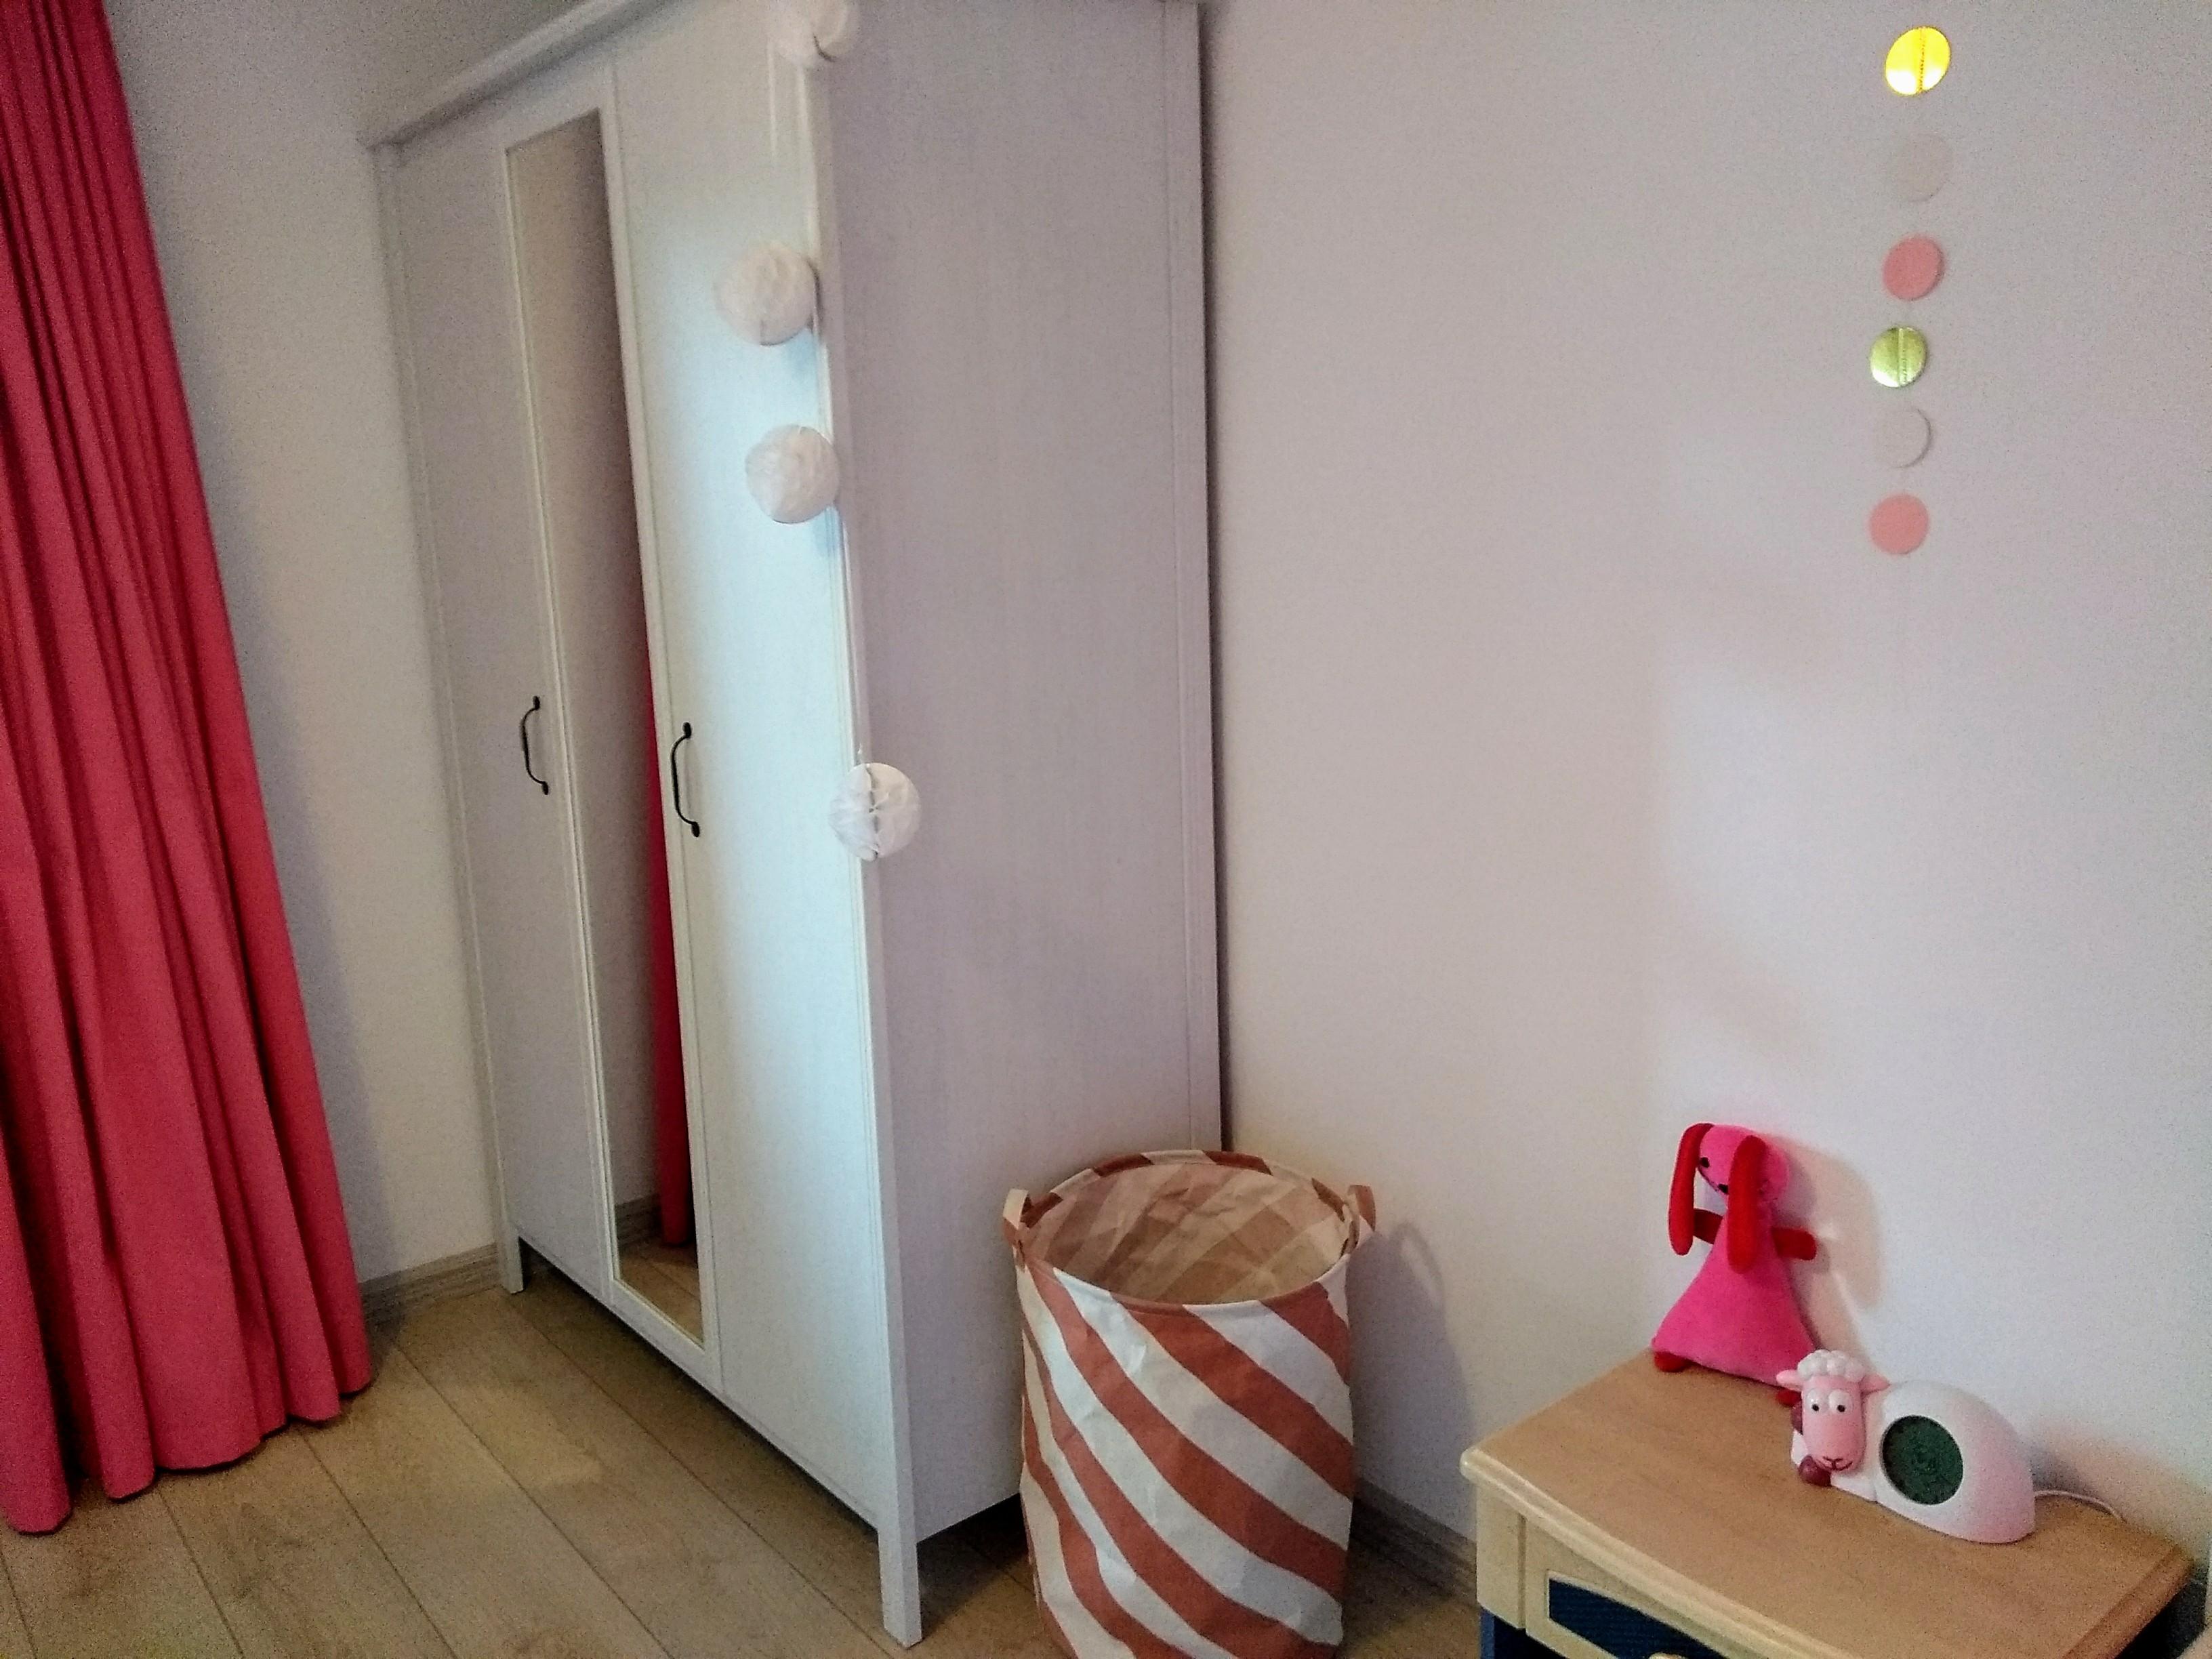 interieur, kinderkamer, kinderkamers, nieuwe kamers, klussen, verbouwen, mamablog, mamalifestyle, lalog.nl